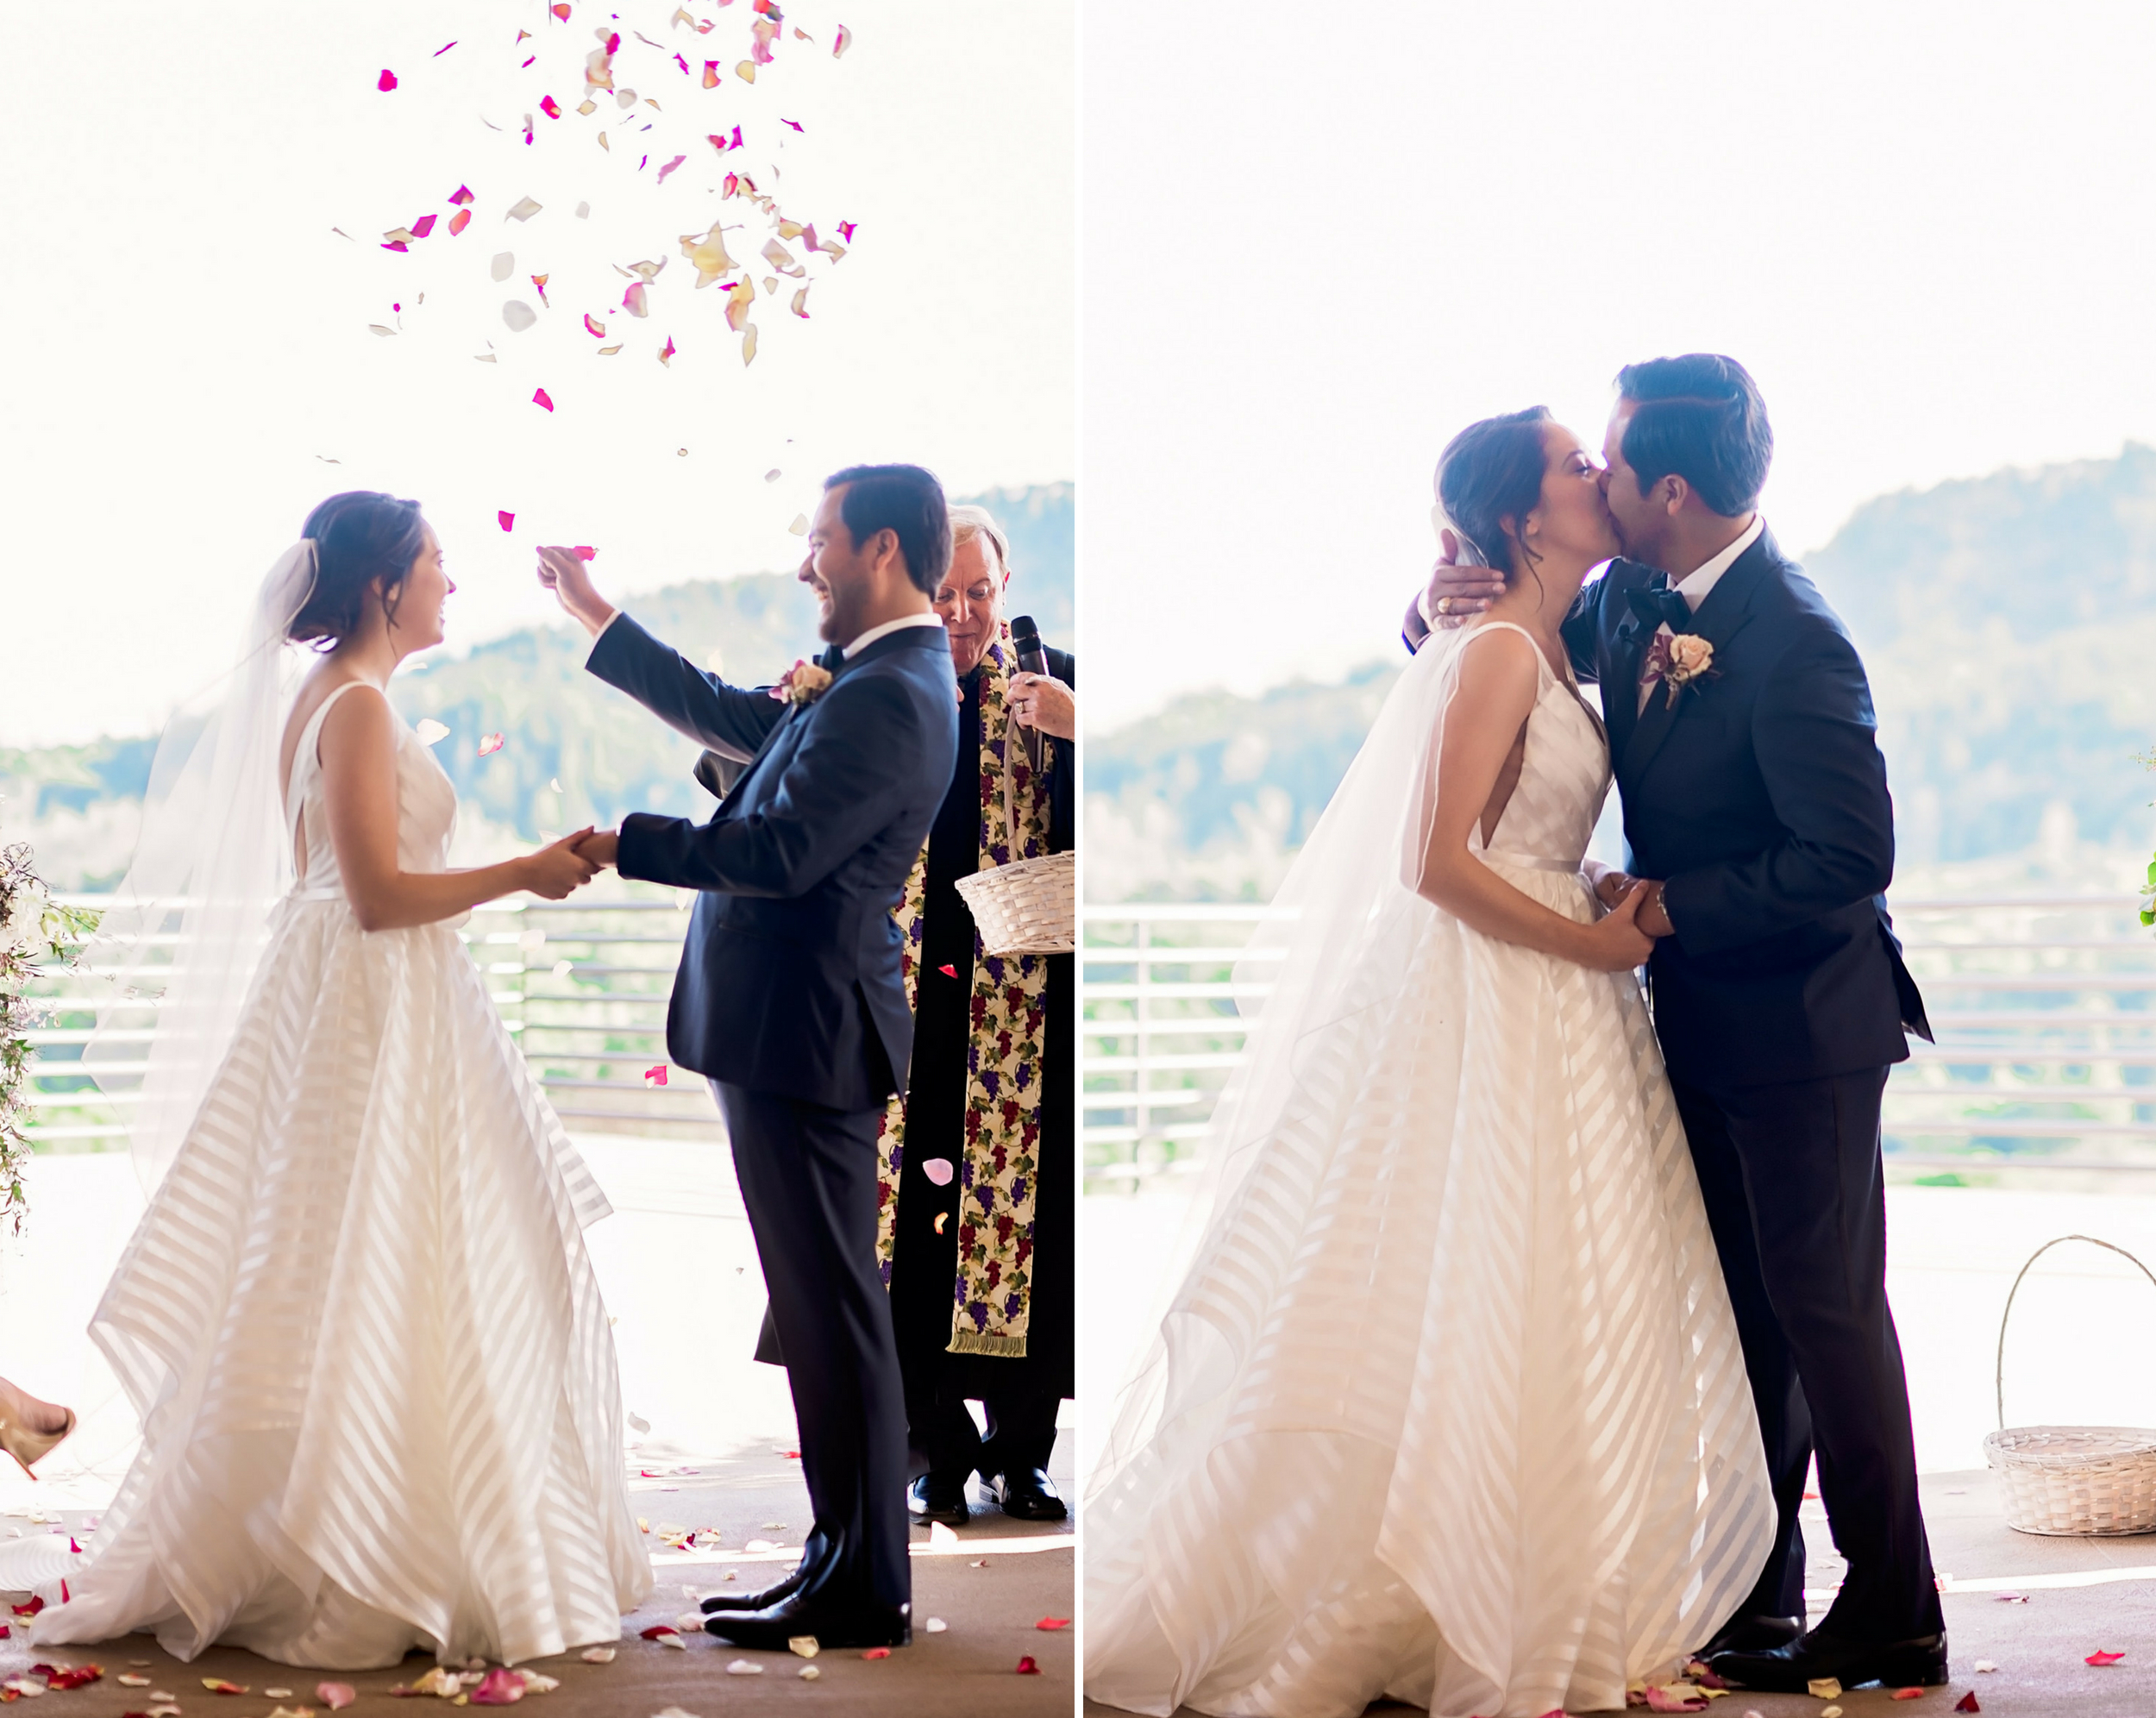 Rachel-Sergio-Wedding-Pharris-Photos-12.jpg